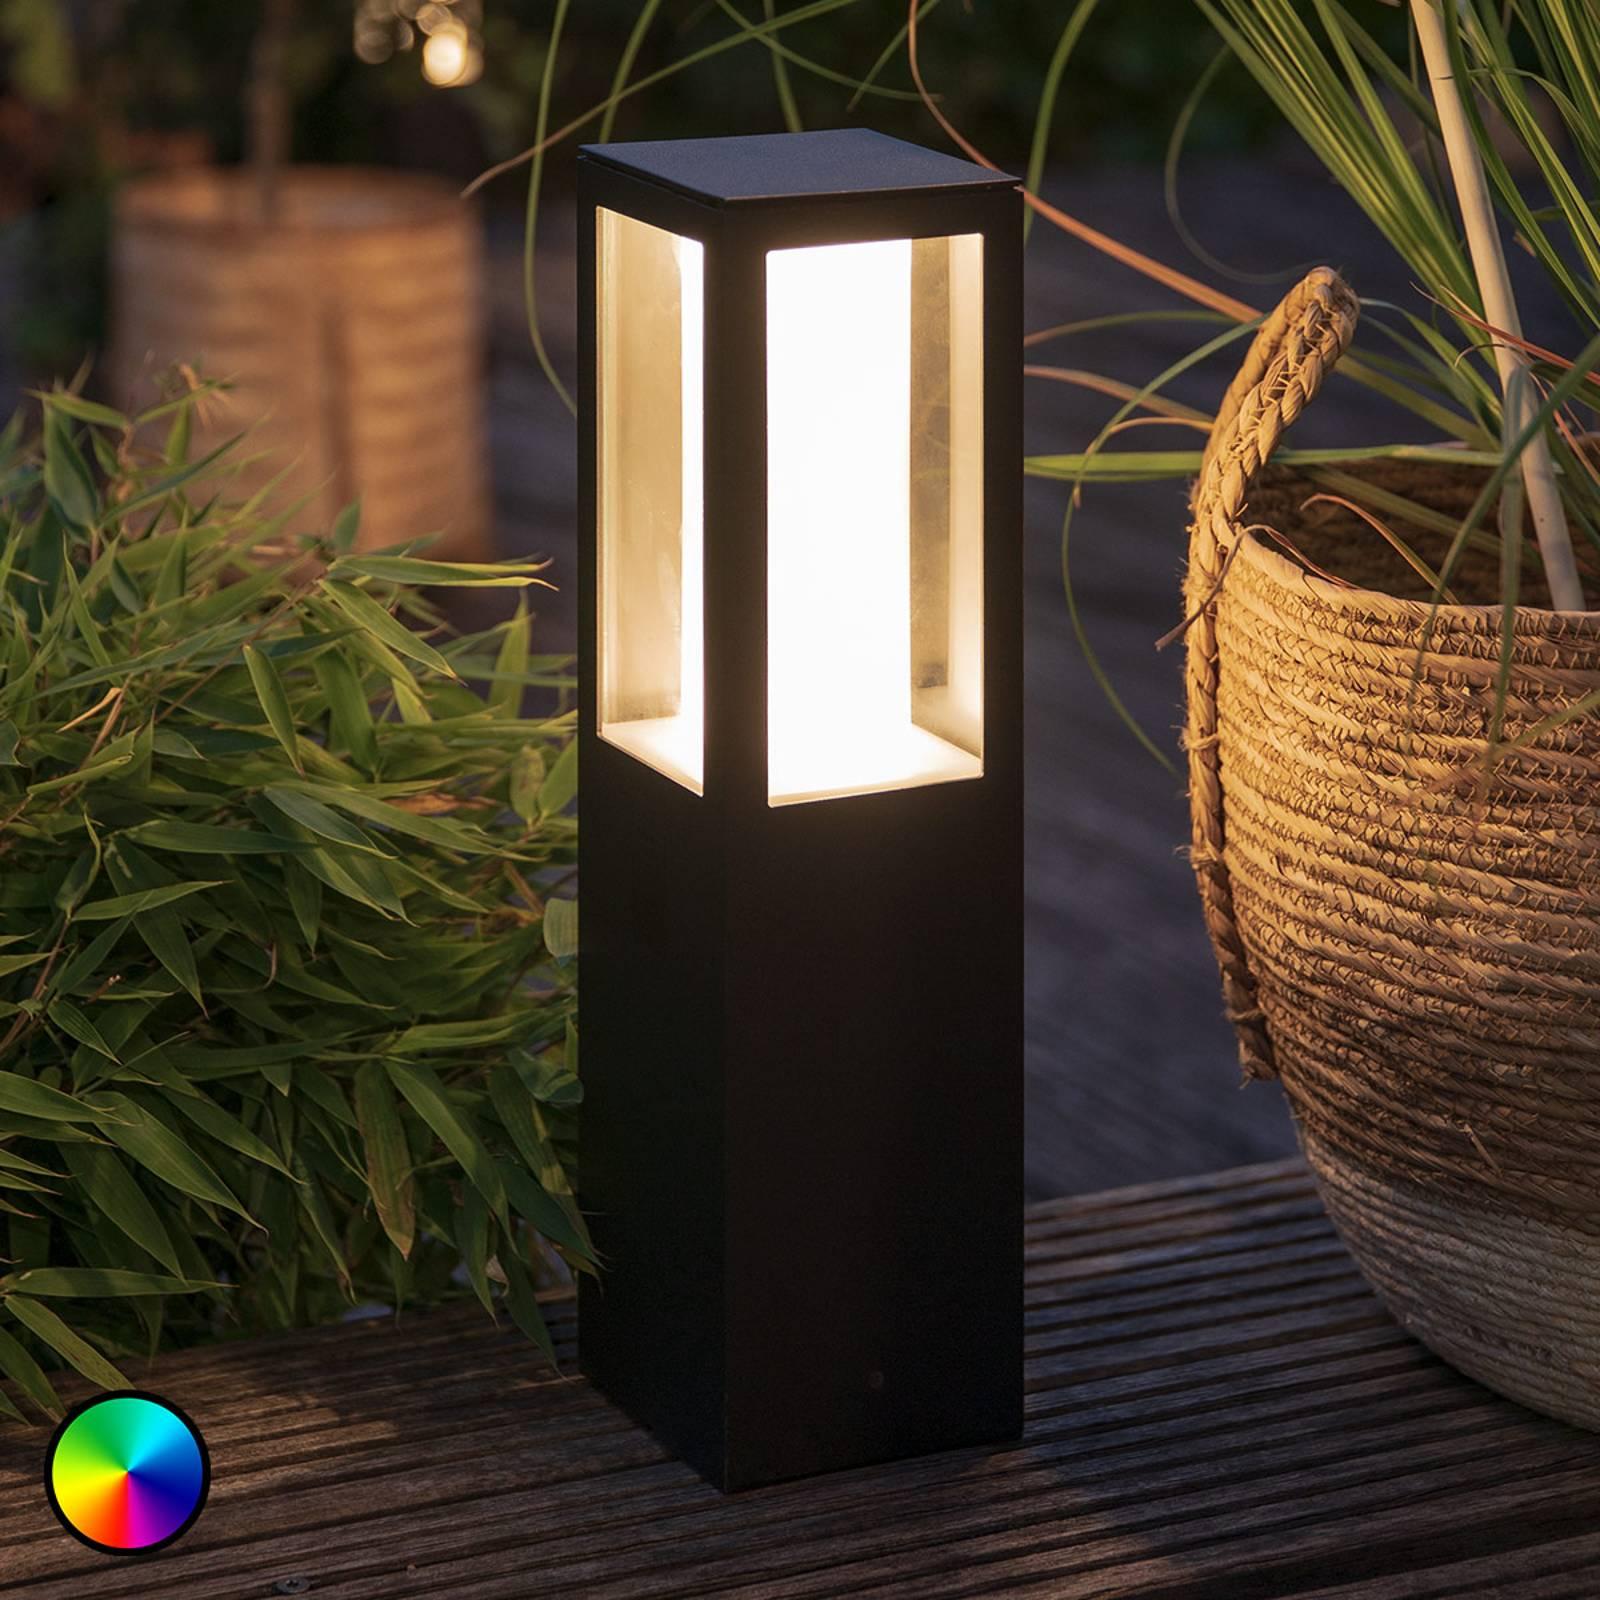 Philips Hue White+Color Impress LED-pollarivalo